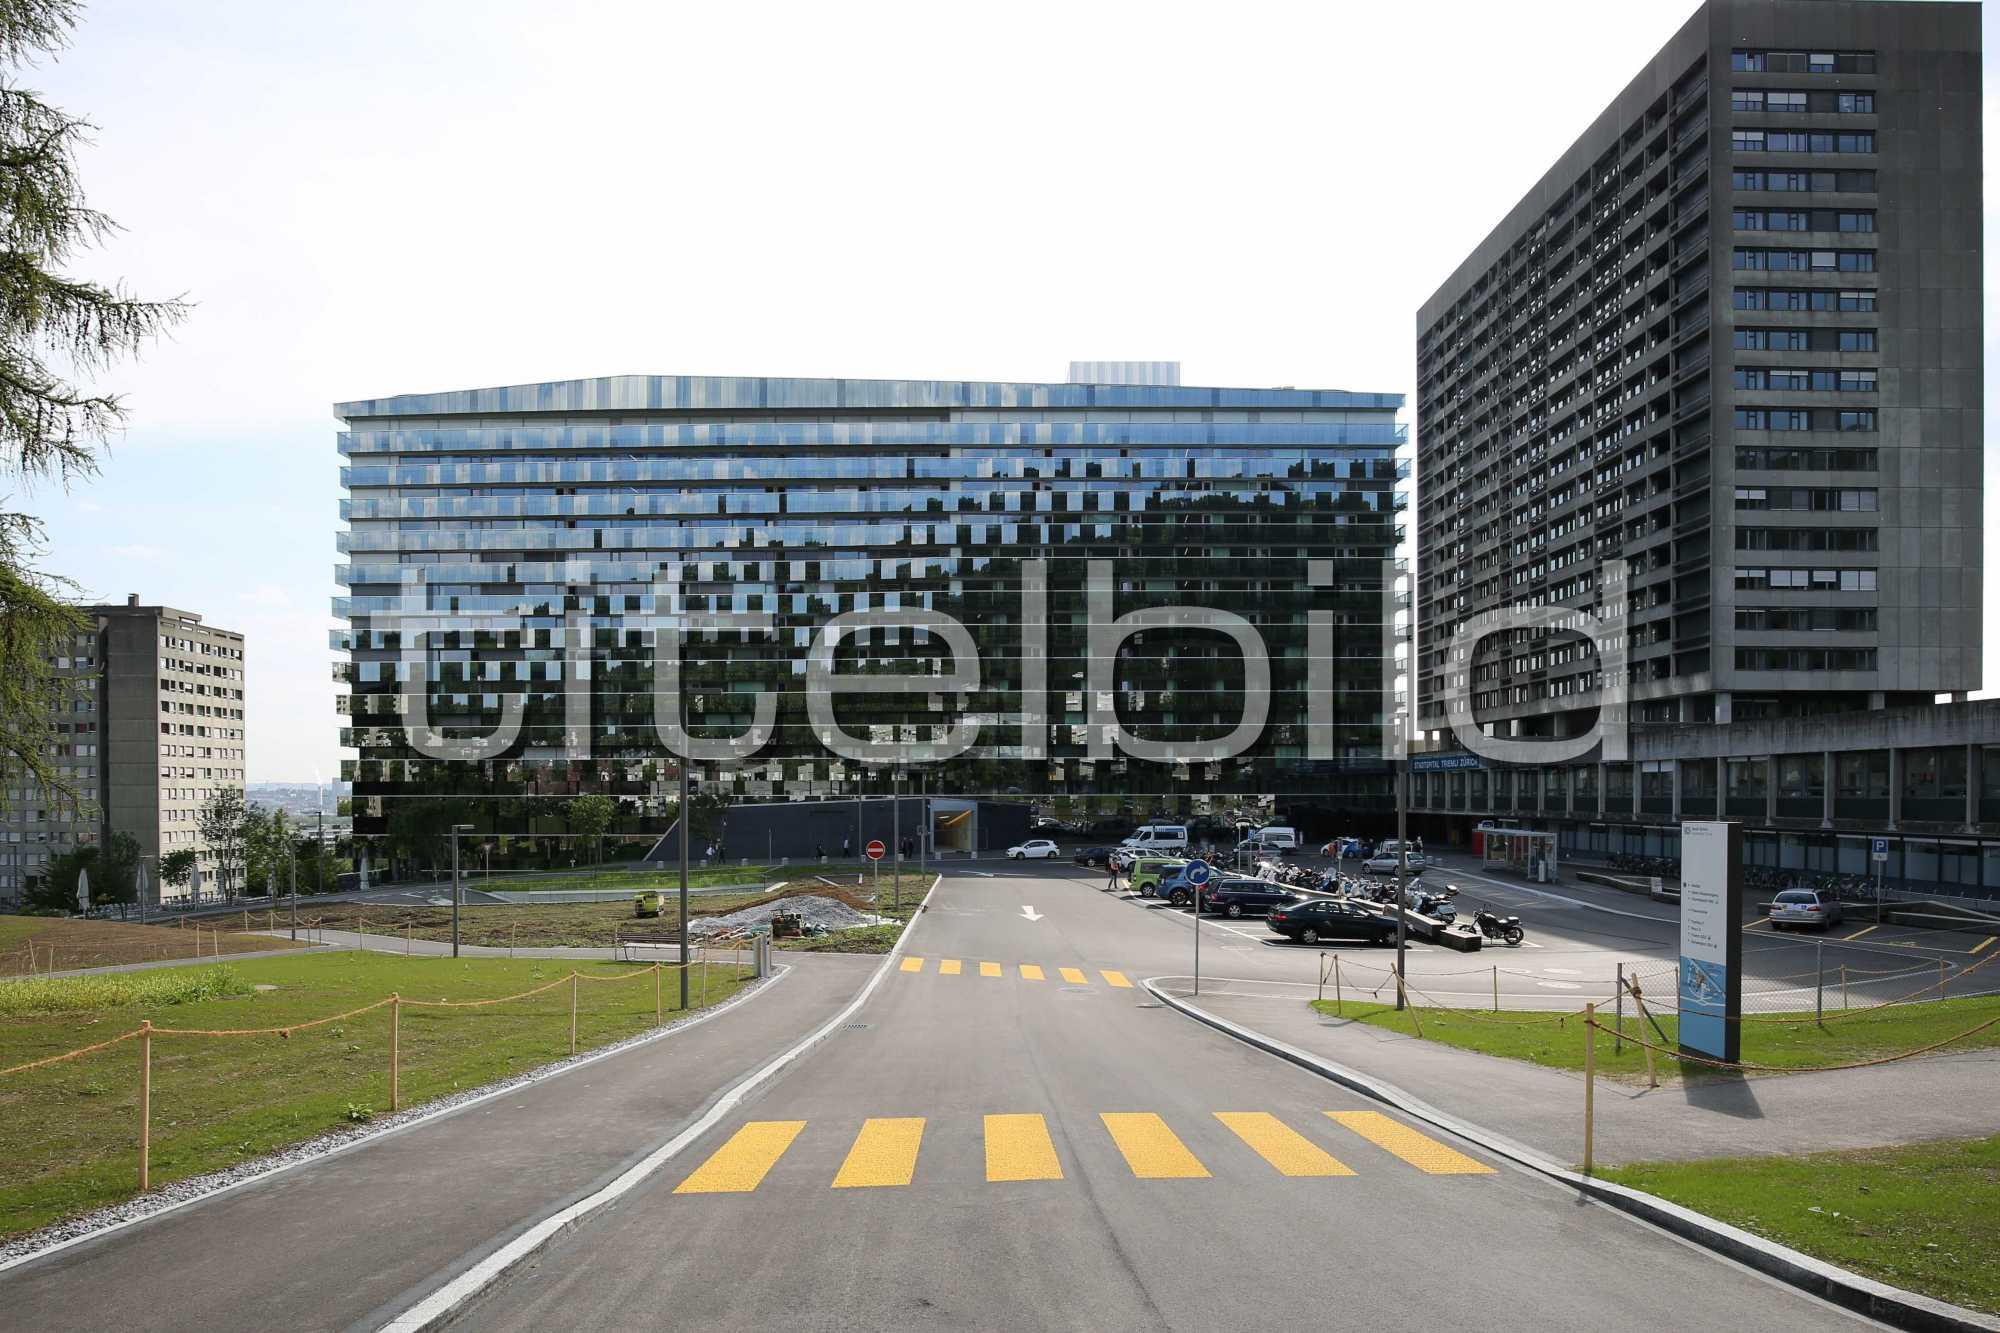 Projektbild-Nr. 2: Bettenhaus Triemli-Spital